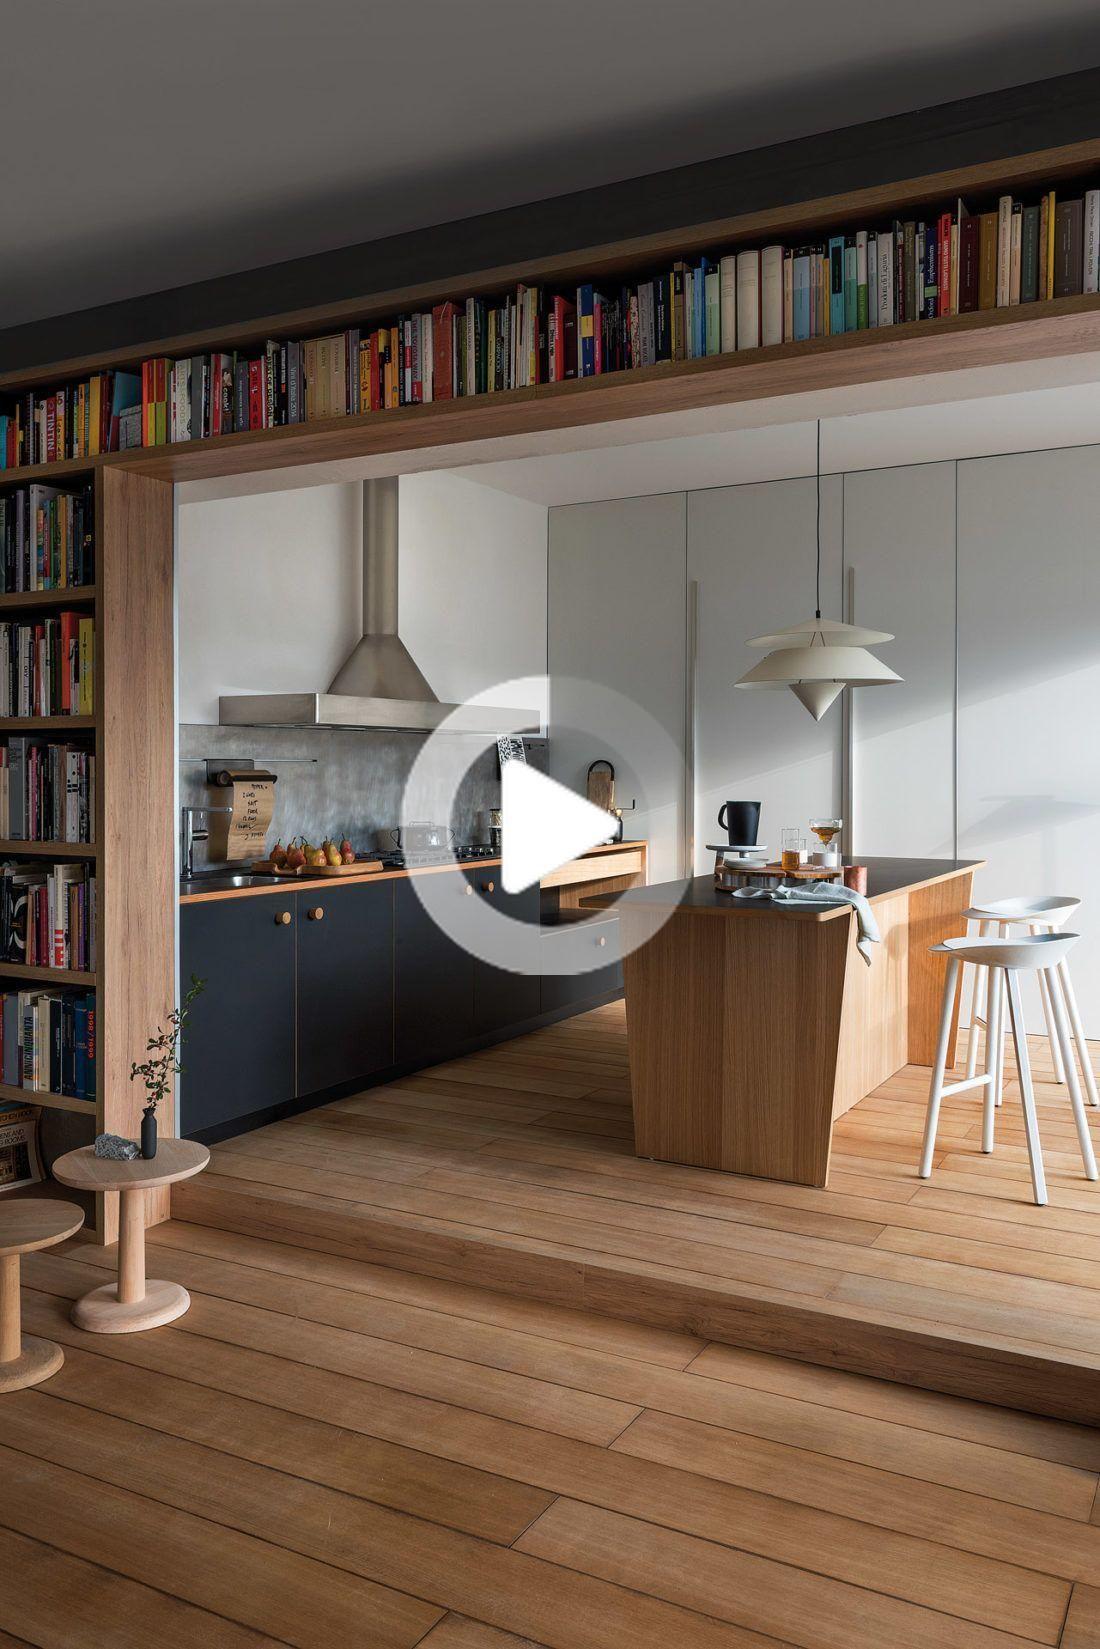 Modern Landhauskueche Weiß Klassisch Holz Kueche Kochinsel Bora Neff 061 – Wood Desings in 2020 ...